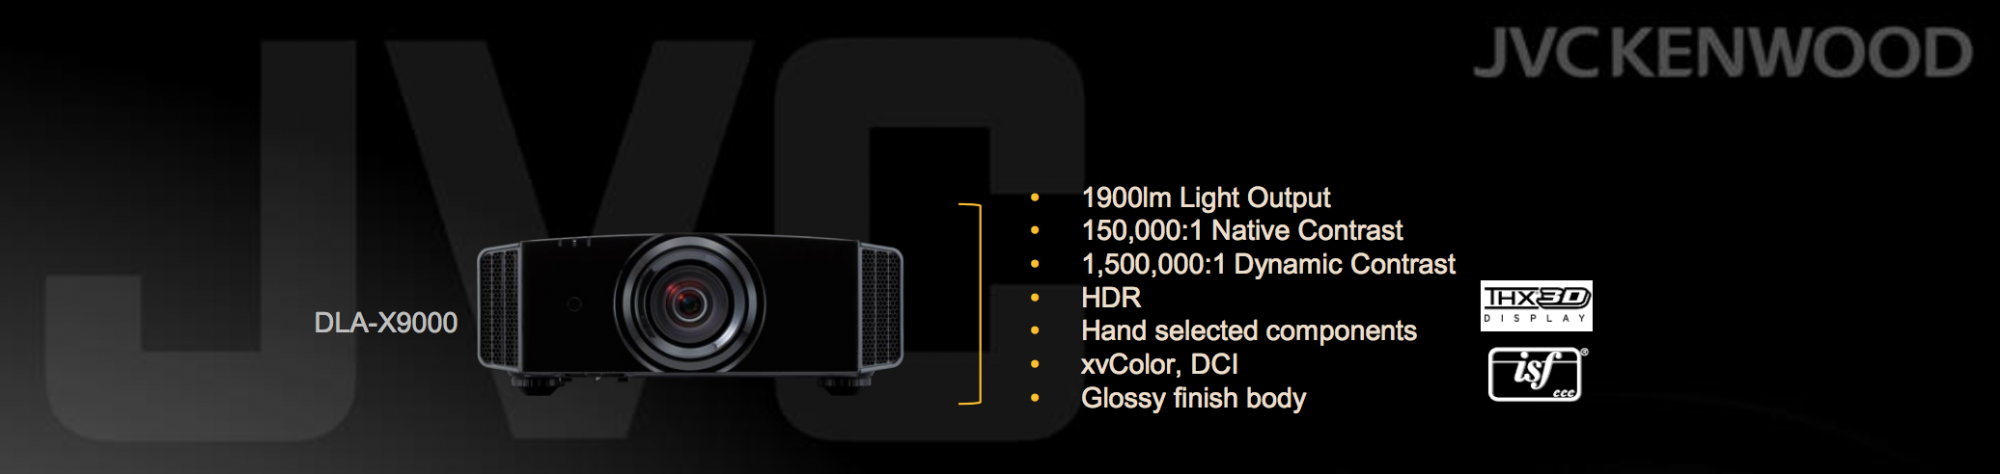 videoprojecteur JVC DLA-X9000